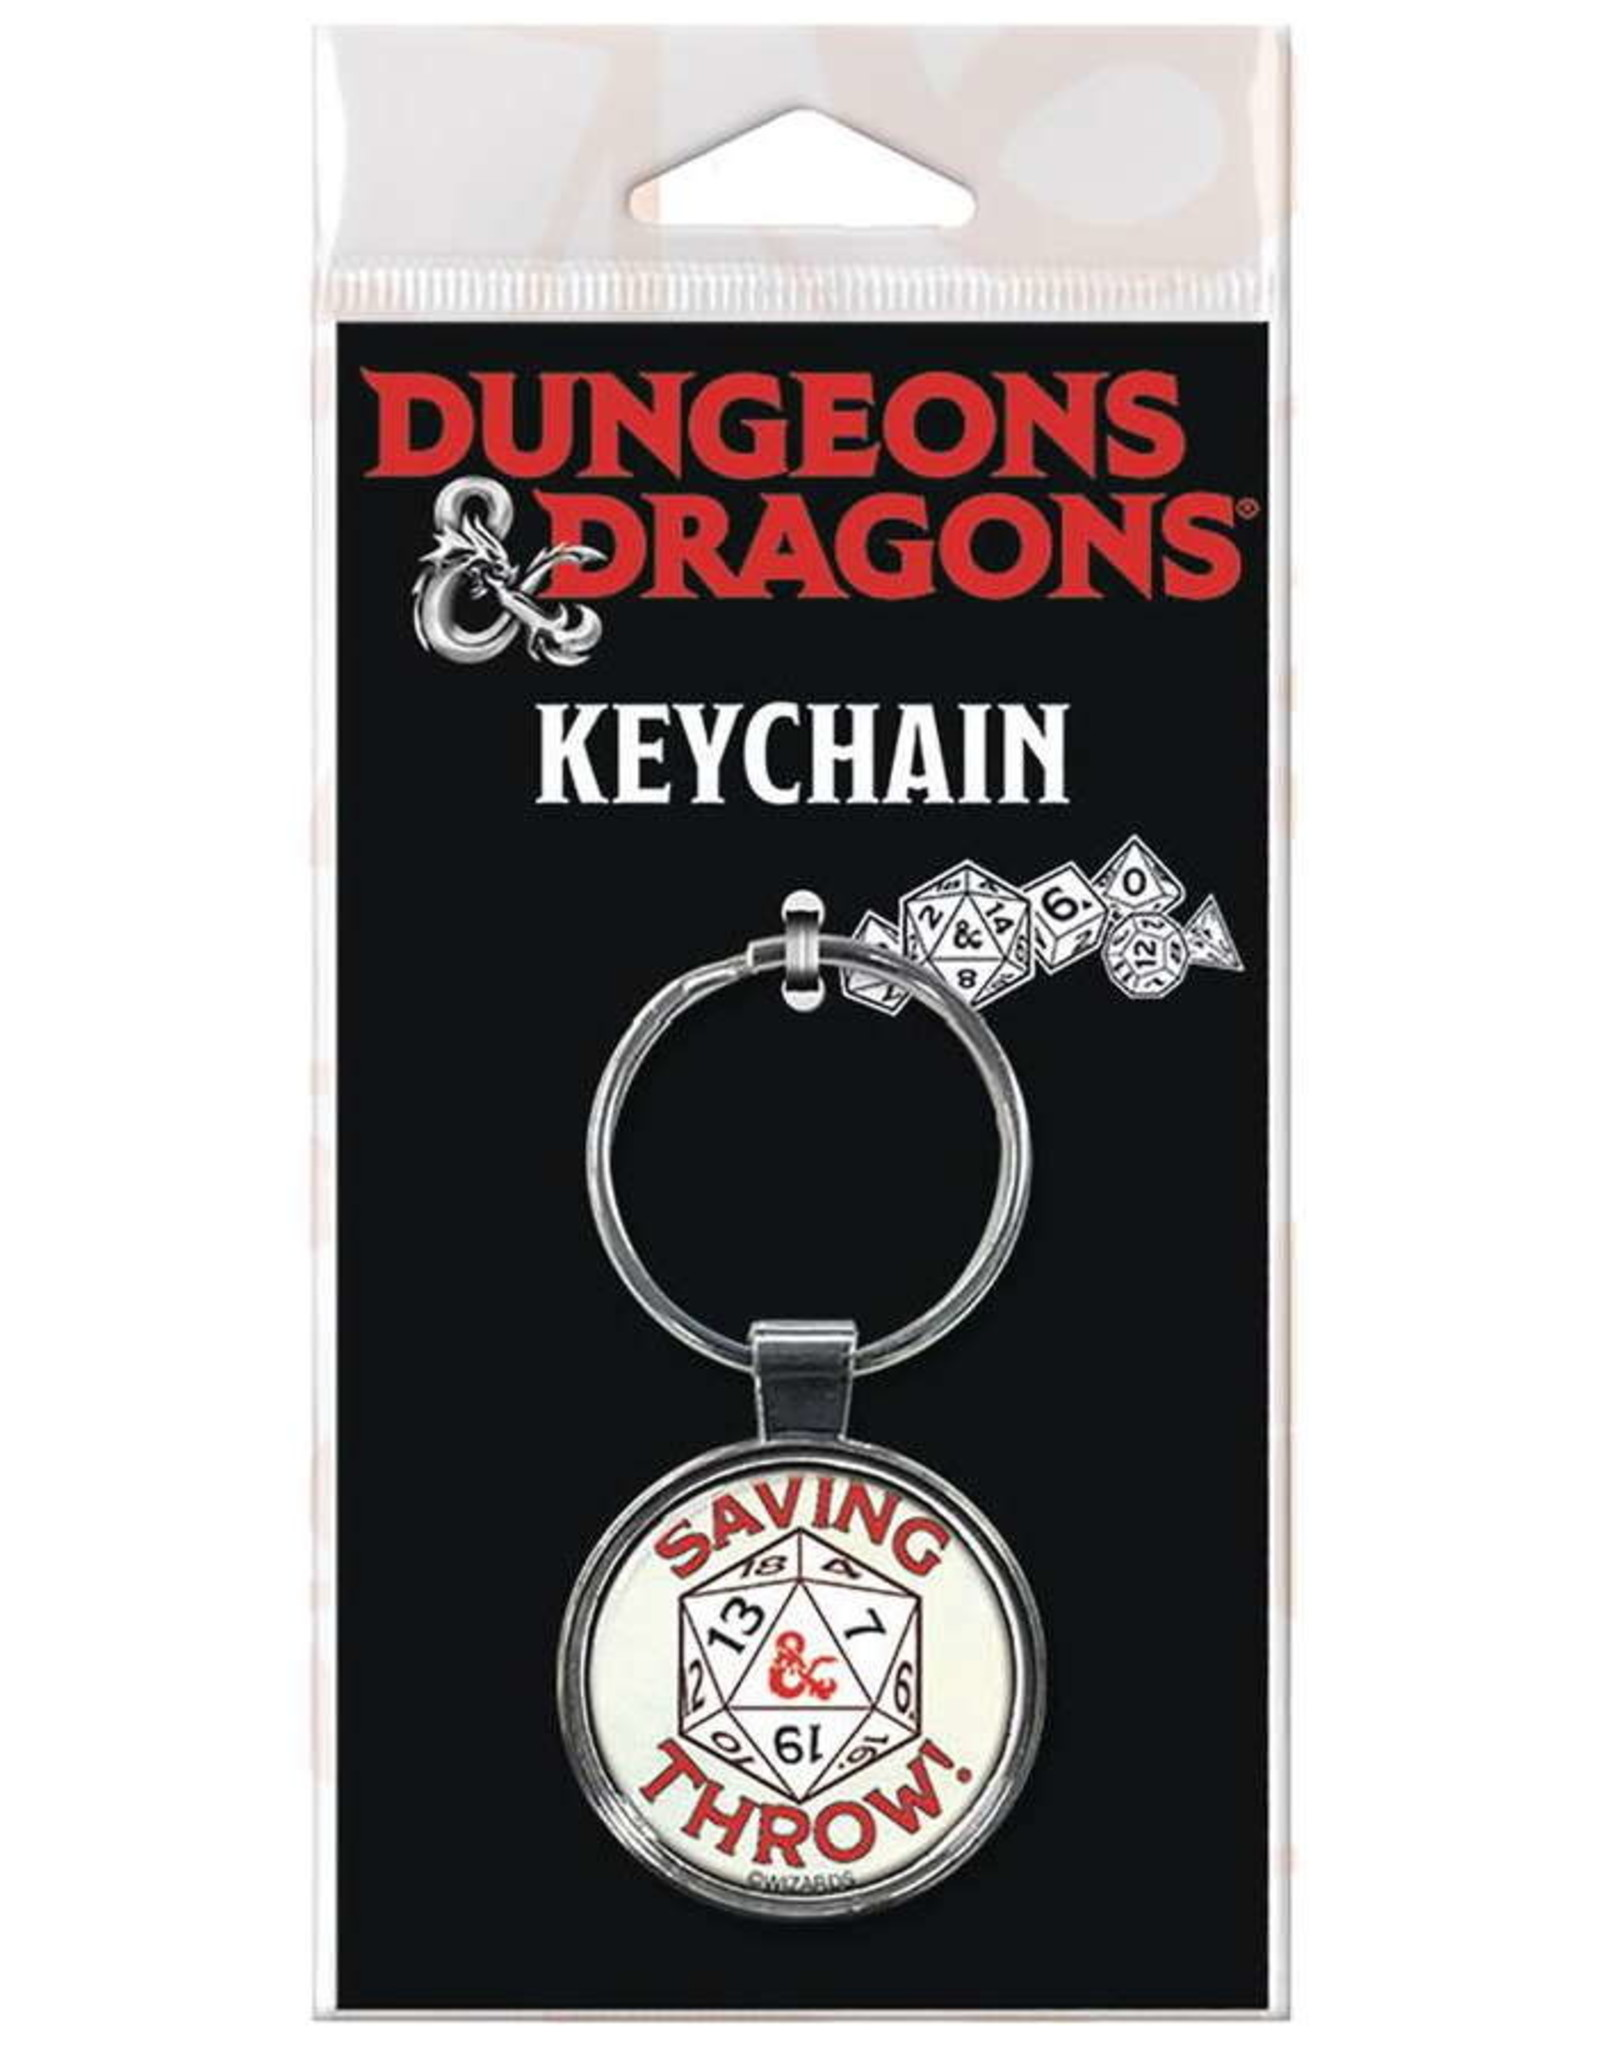 DUNGEONS & DRAGONS KEYCHAIN SAVING THROW